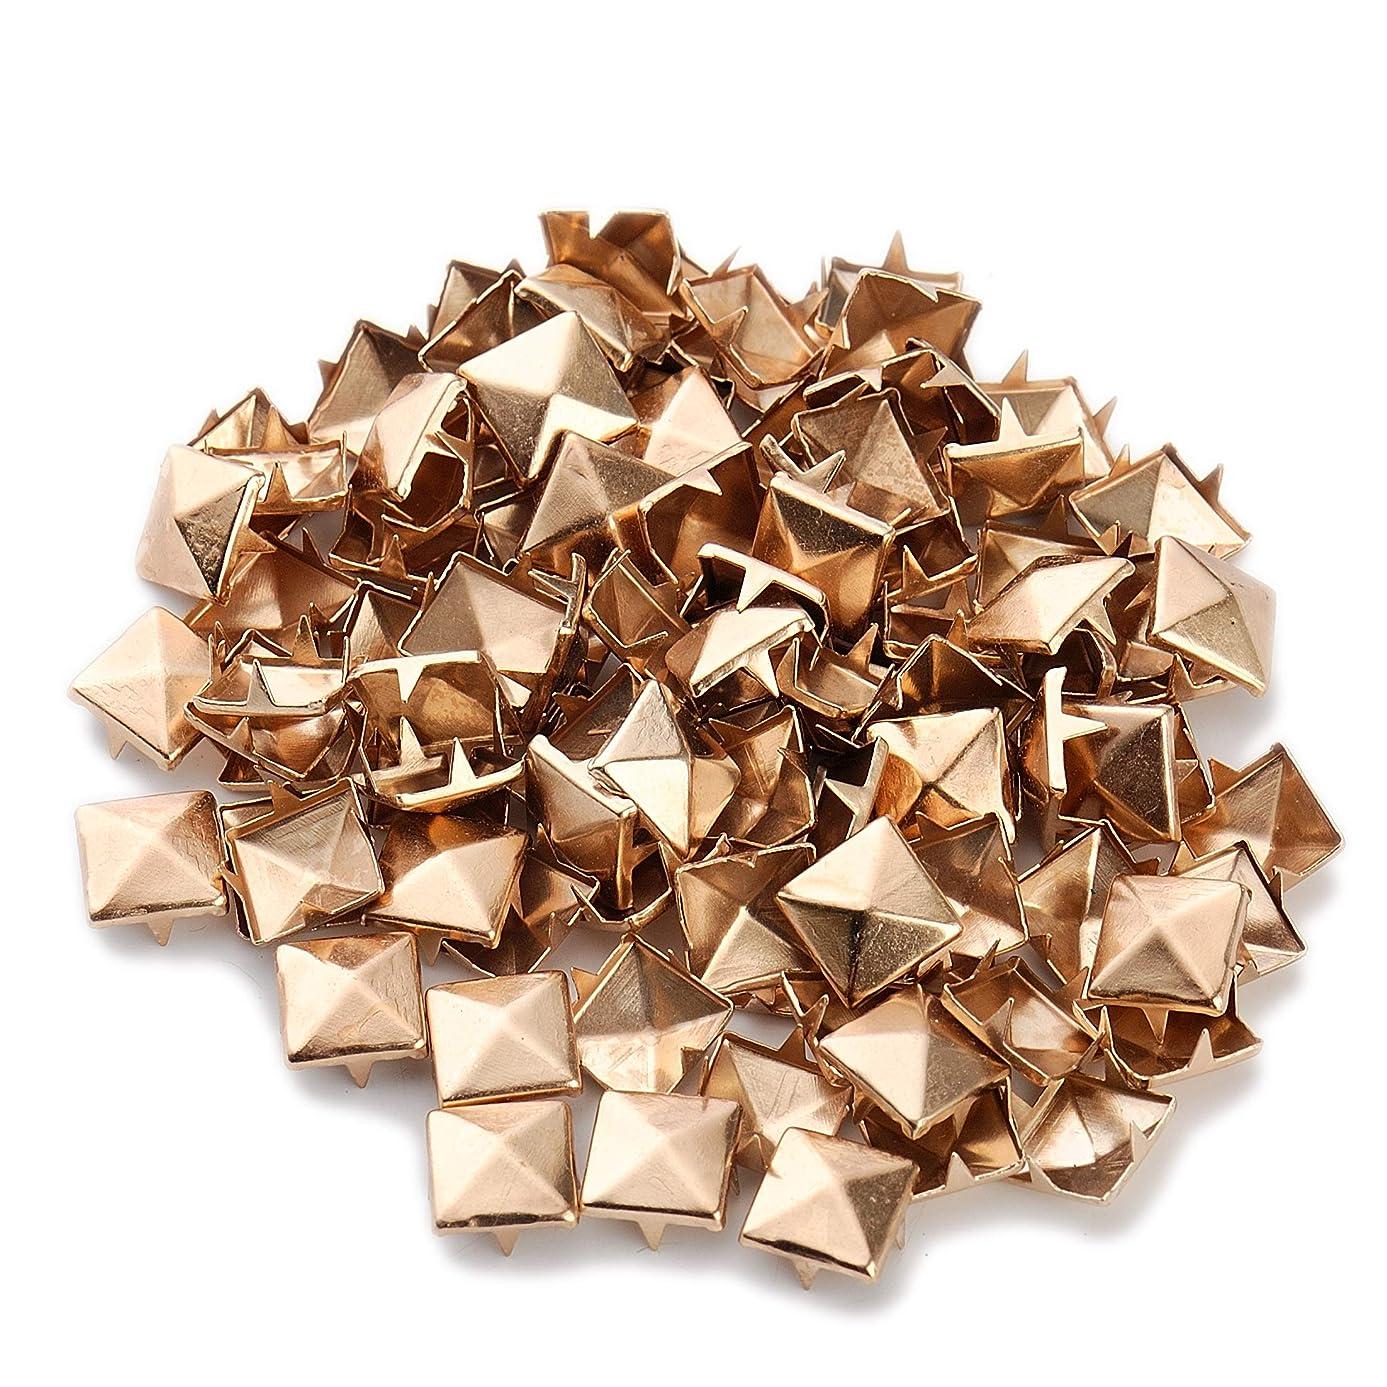 100pcs Punk Colors Metal Square Pyramid Rivet Cone Studs Nailhead Craft Spike DIY 10mm 3/8